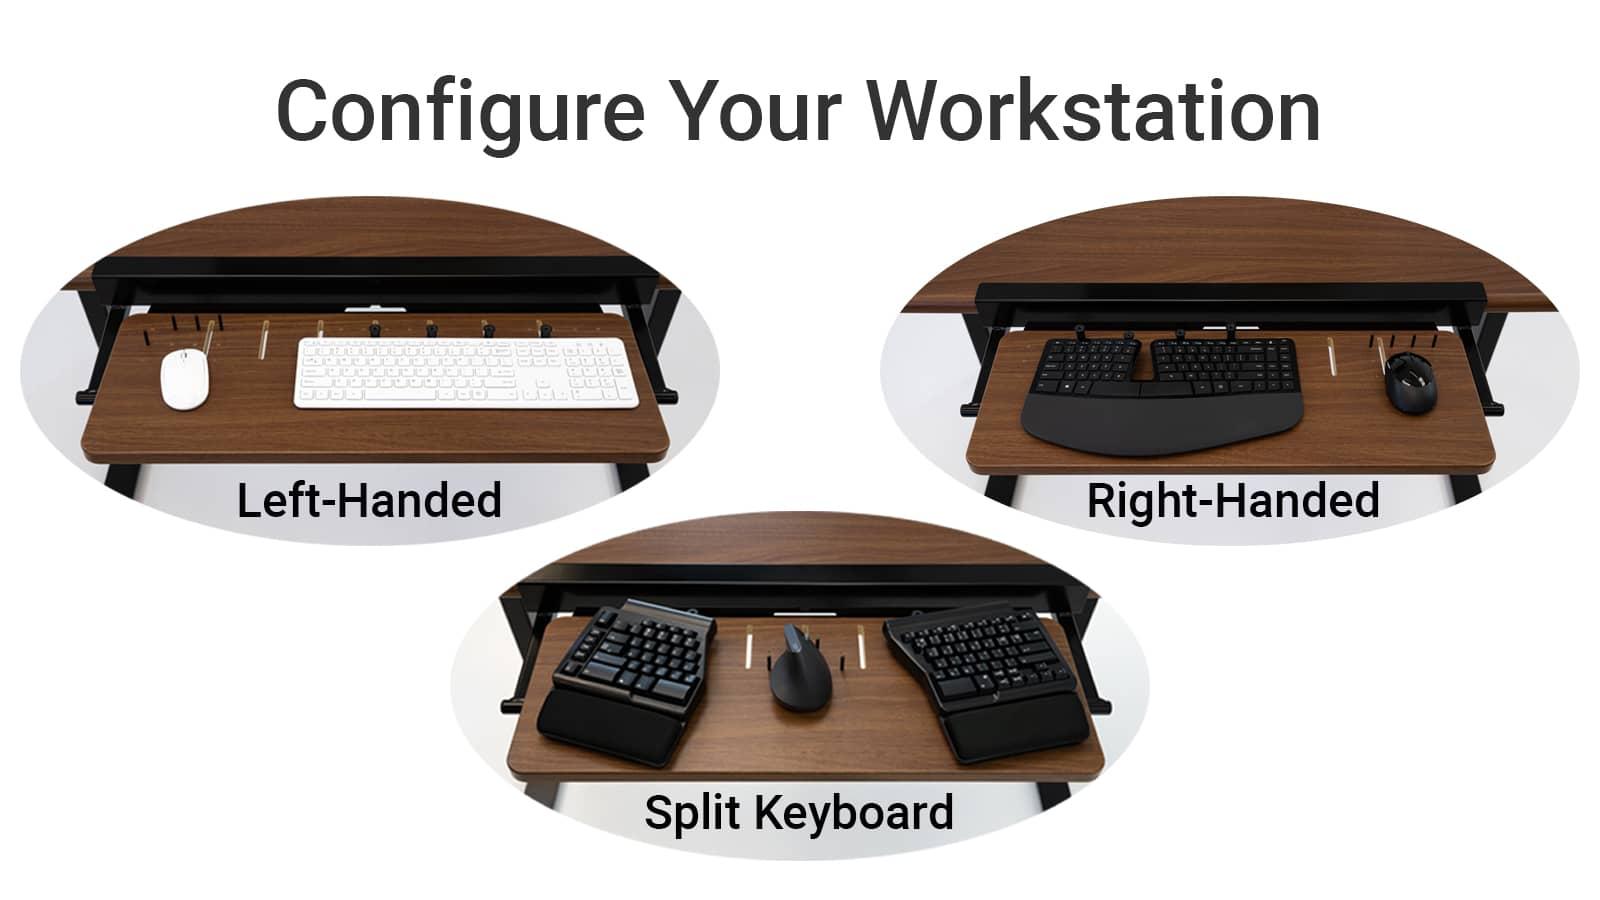 Configure Your Workstation